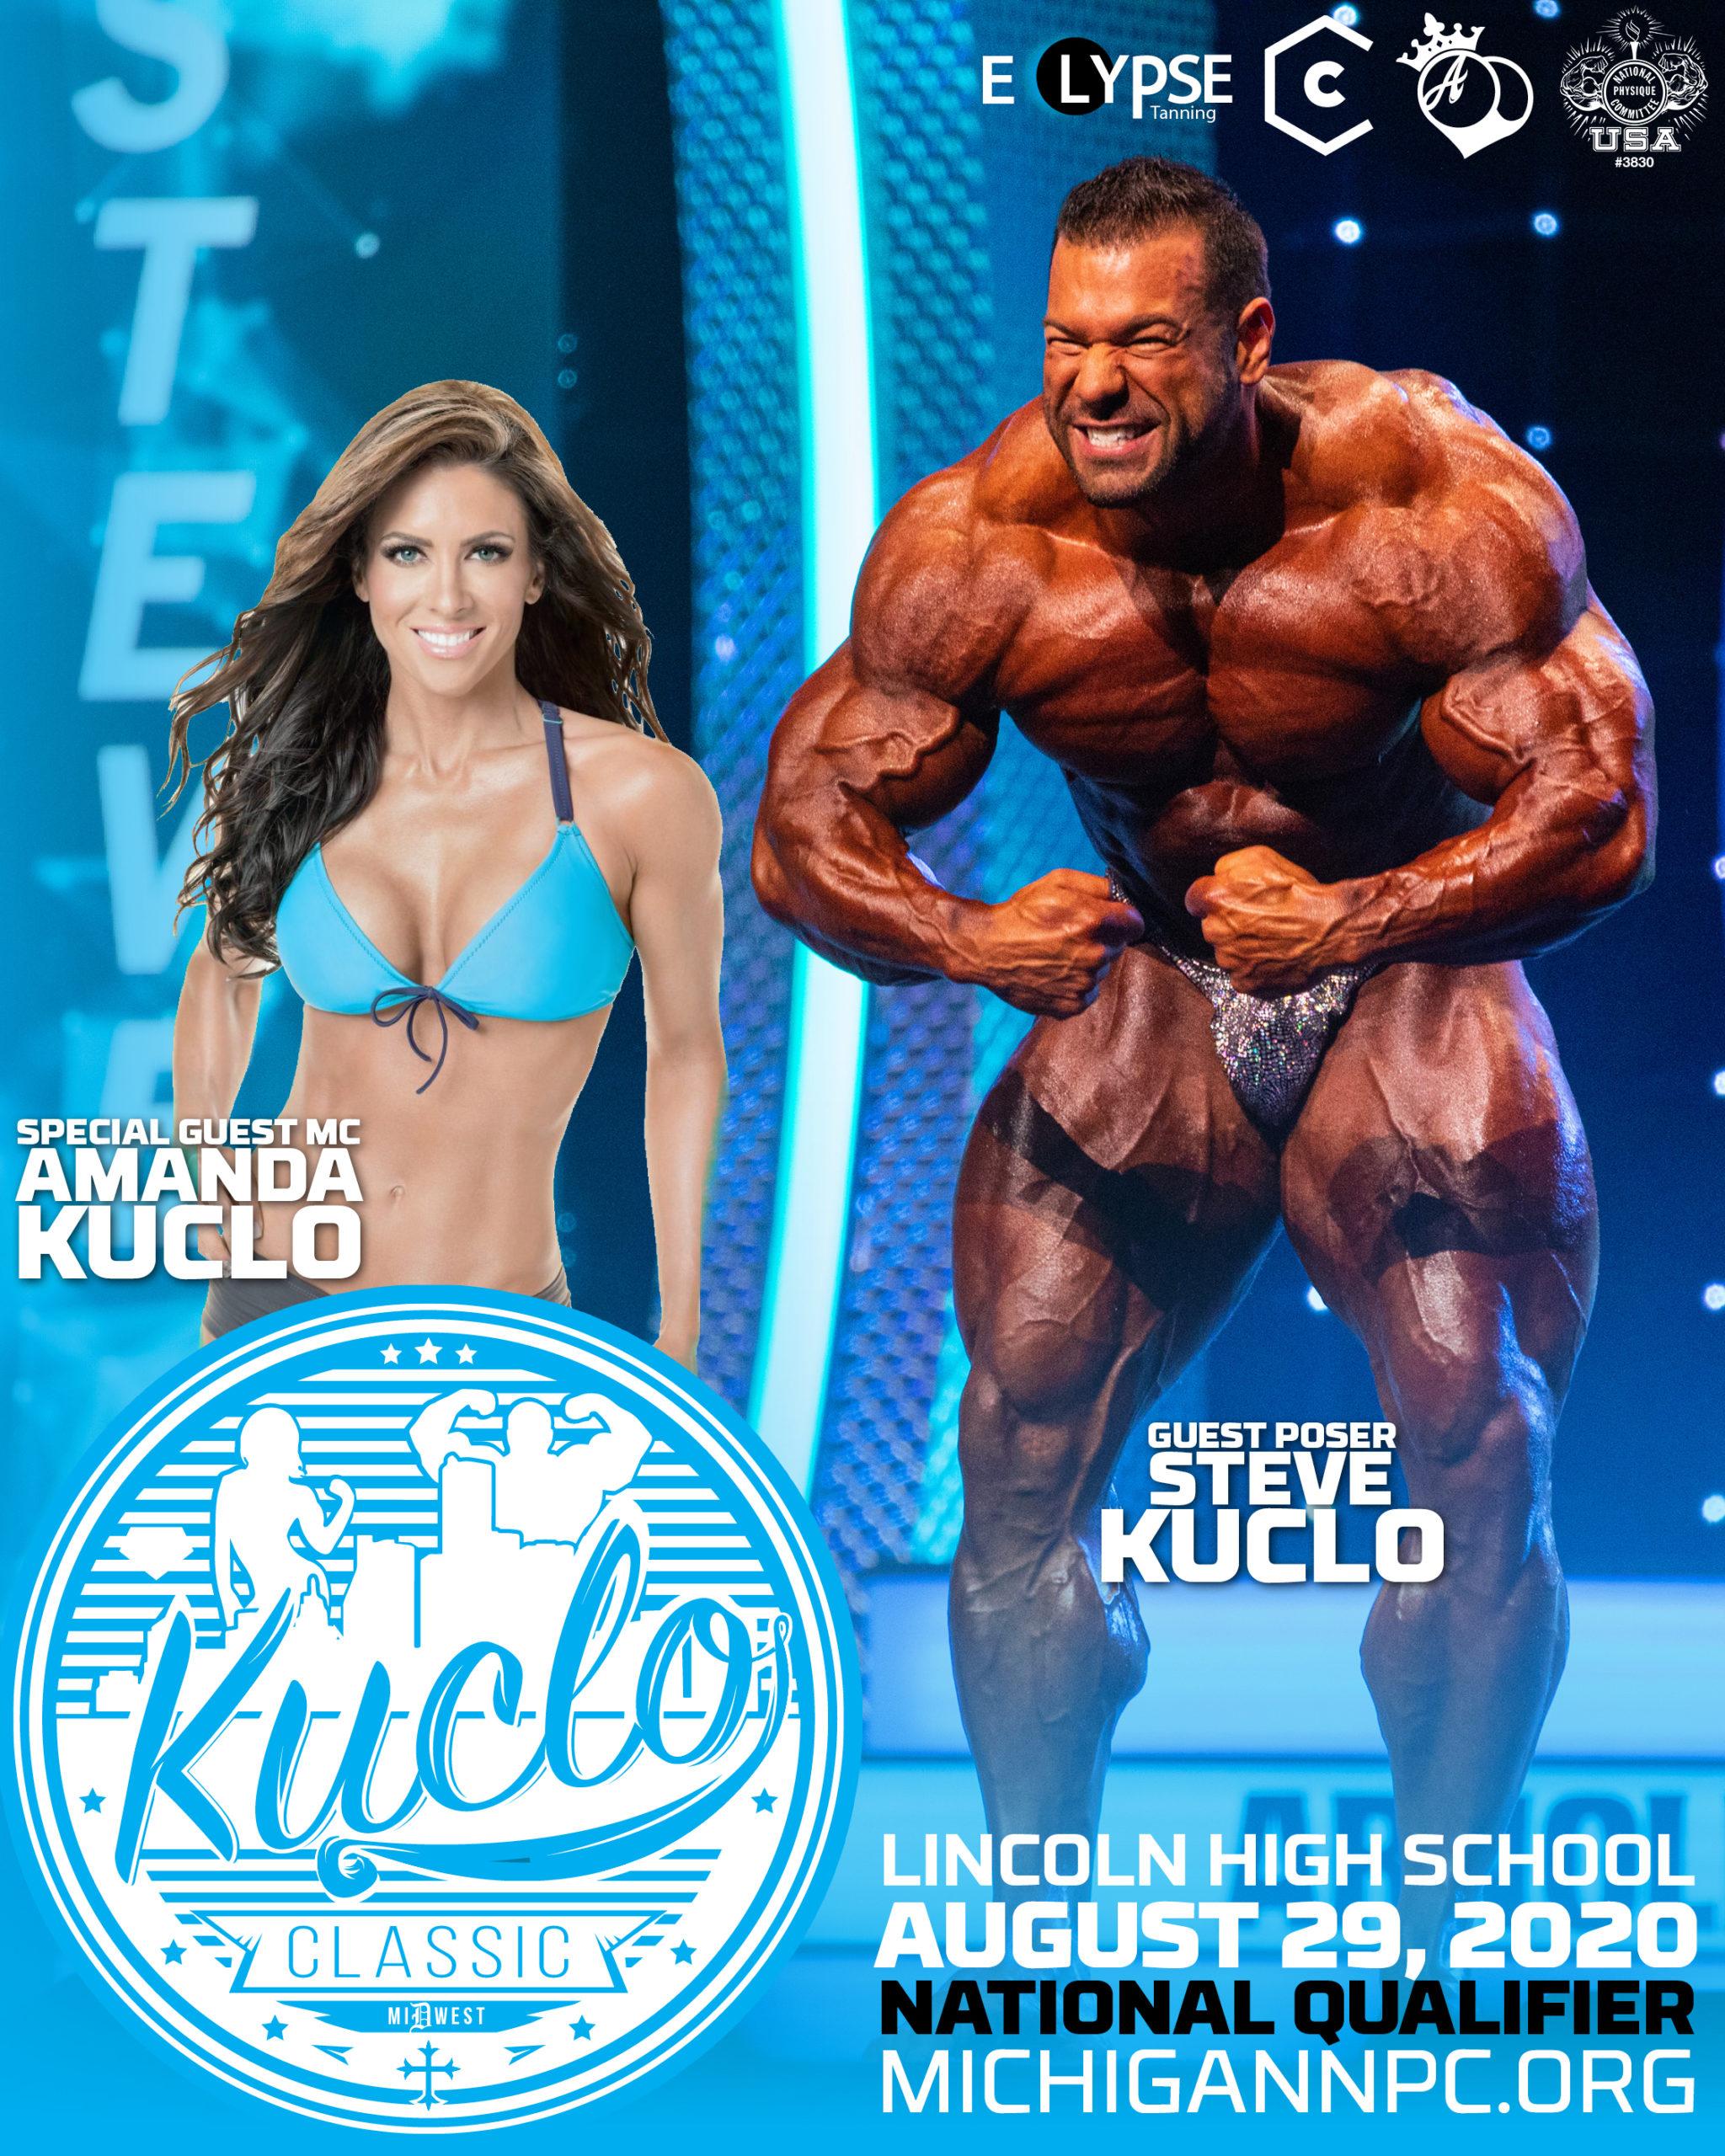 NPC Kuclo Classic Midwest Poster